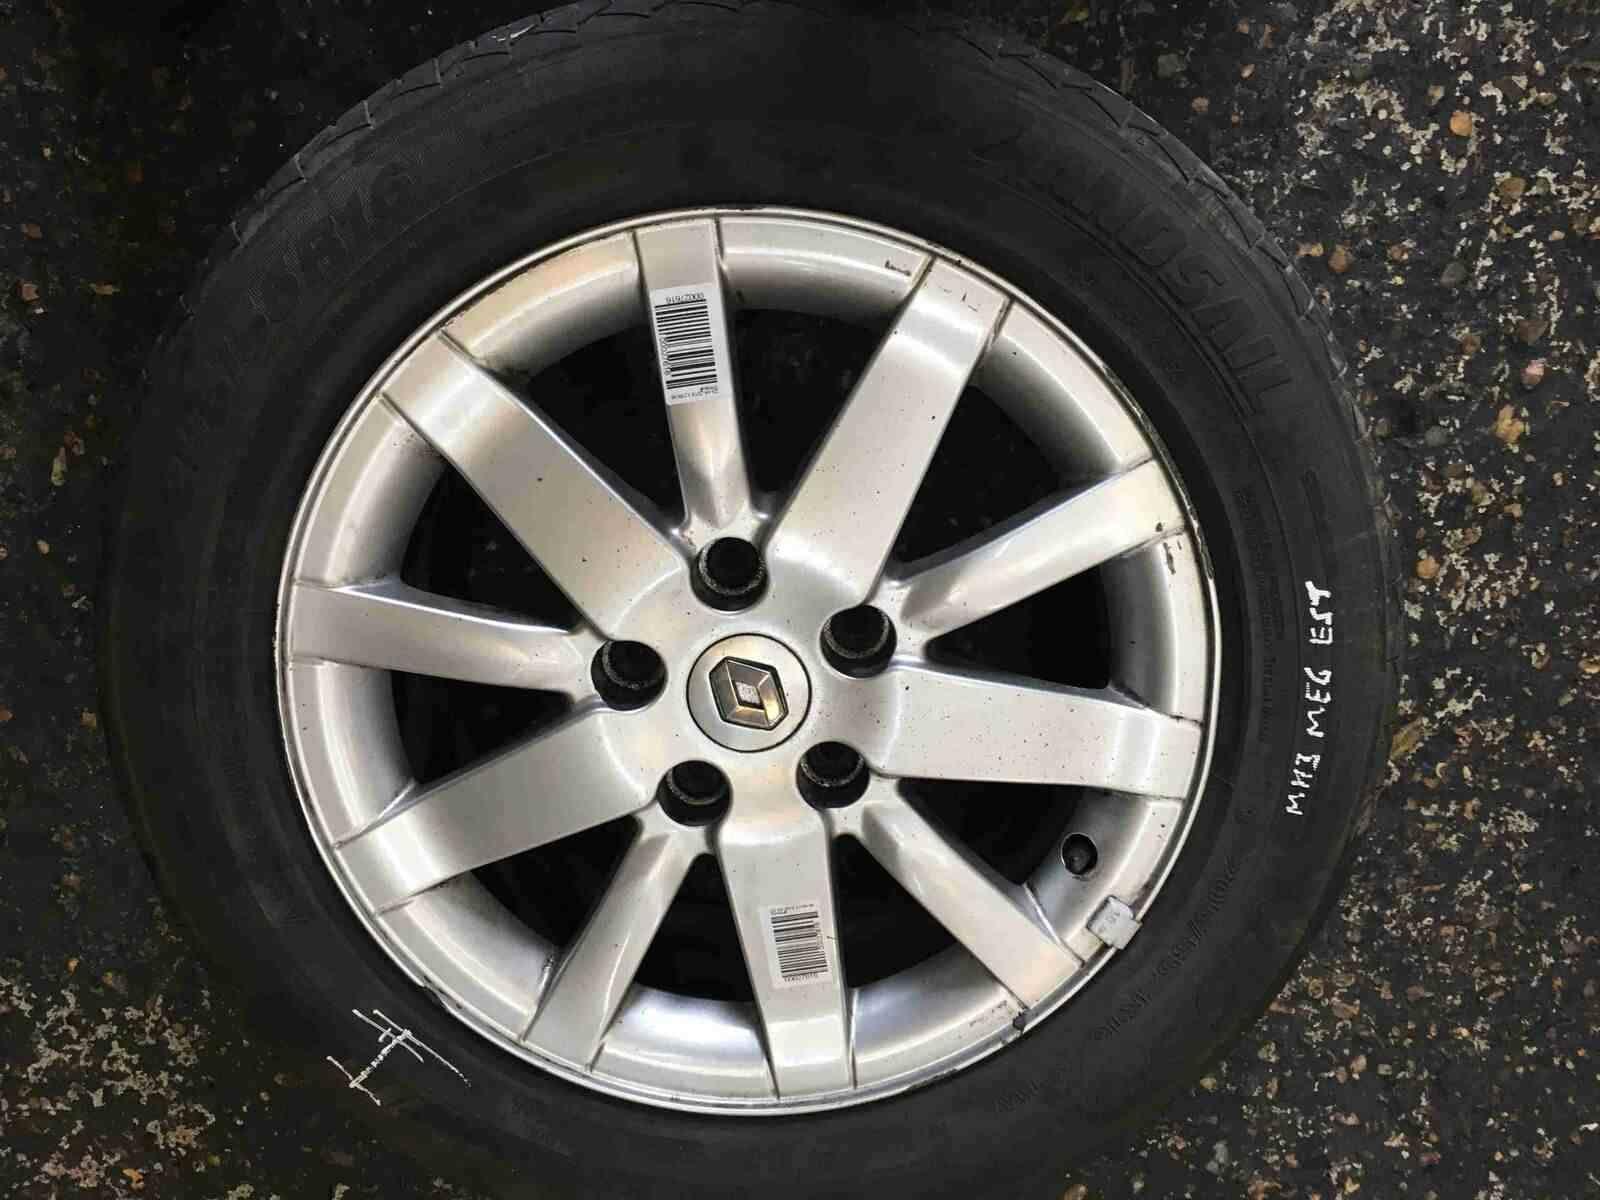 Renault Megane MK3 2008-2014 Spirale Alloy Wheel +Tyre 205 55 16 6mm 5/5